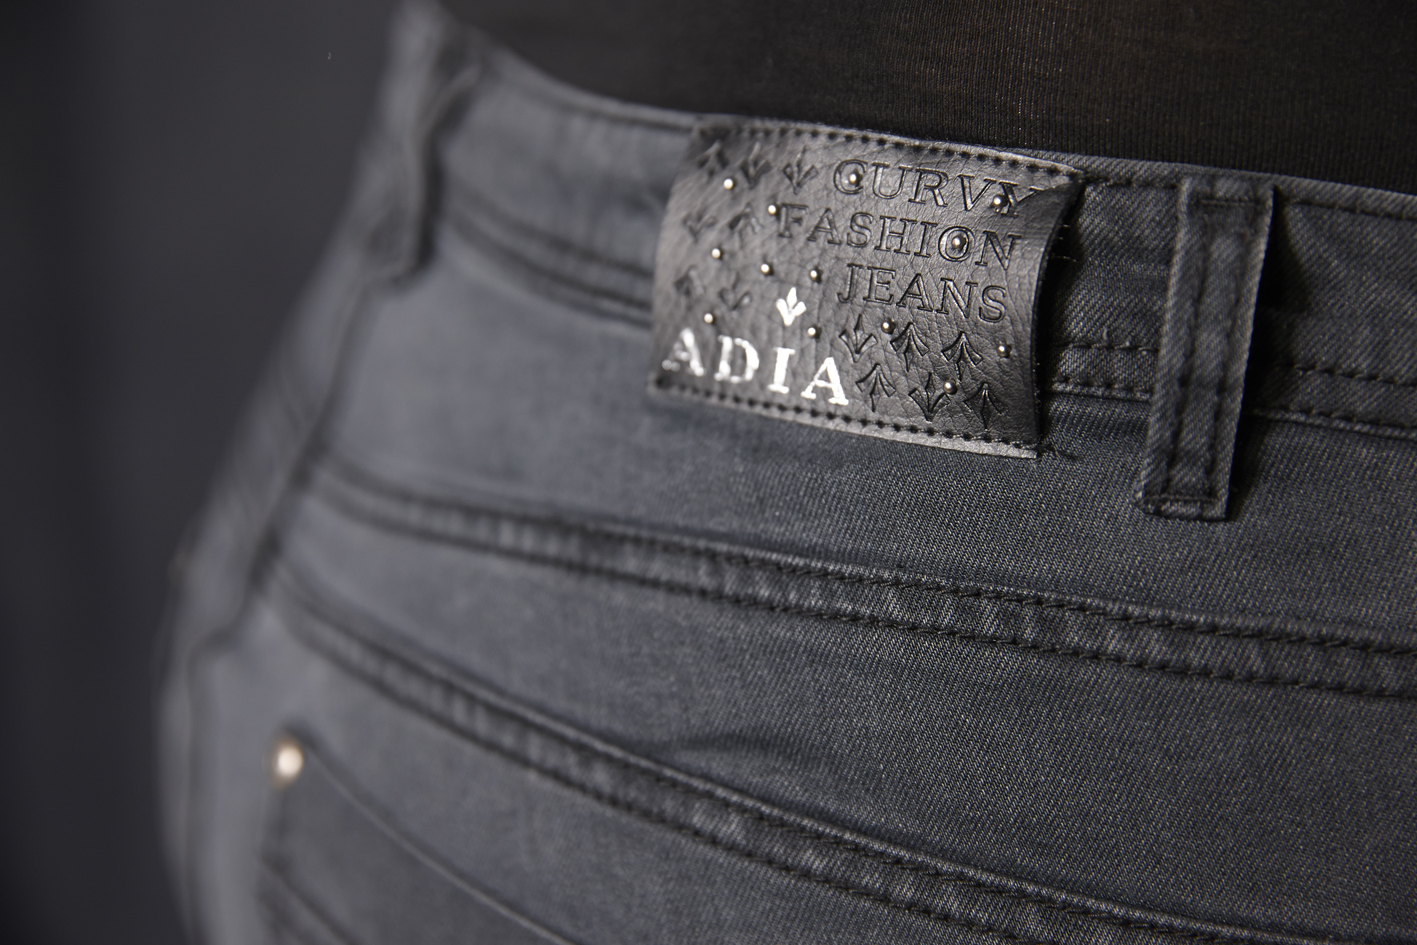 Adia - jeans